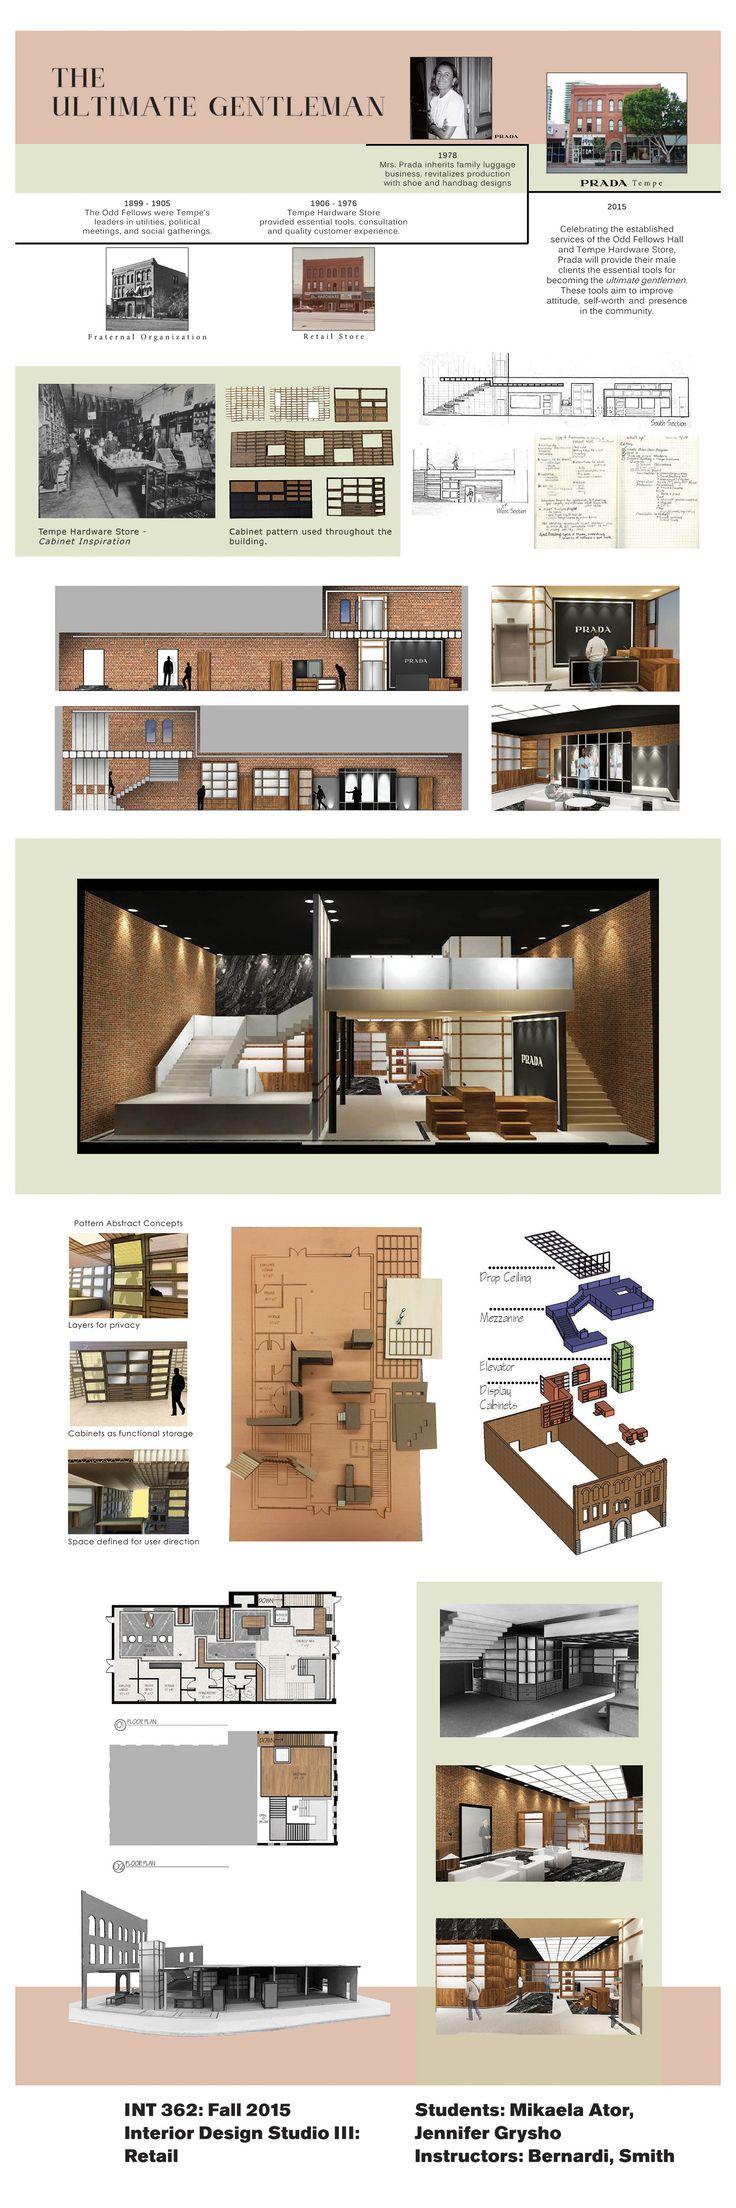 Best 10 interior design programs ideas on pinterest - Nau interior design degree progression plan ...